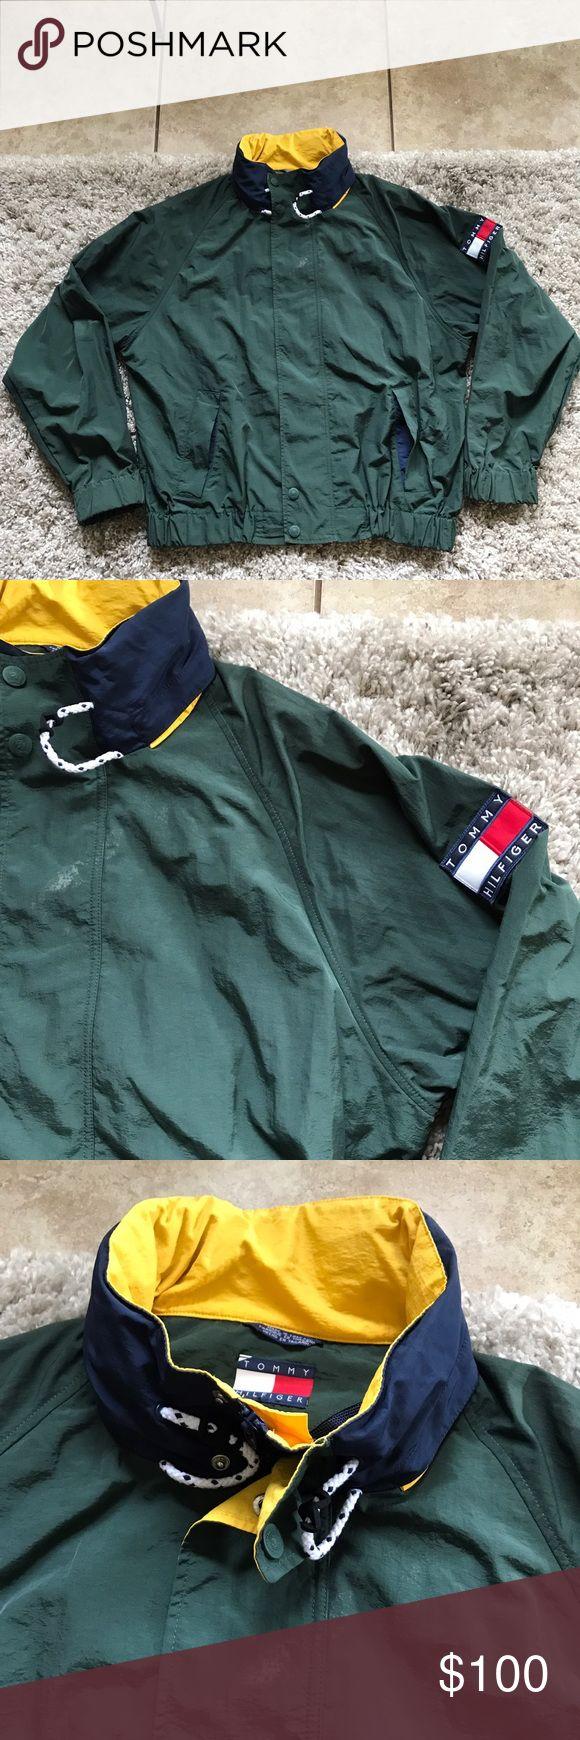 Tommy Hilfiger vintage jacket 90s Men's size Xl / what's your stilo! / rock some og heat / no rips / no peeling / small smudge center / see pics / unique piece Tommy Hilfiger Jackets & Coats